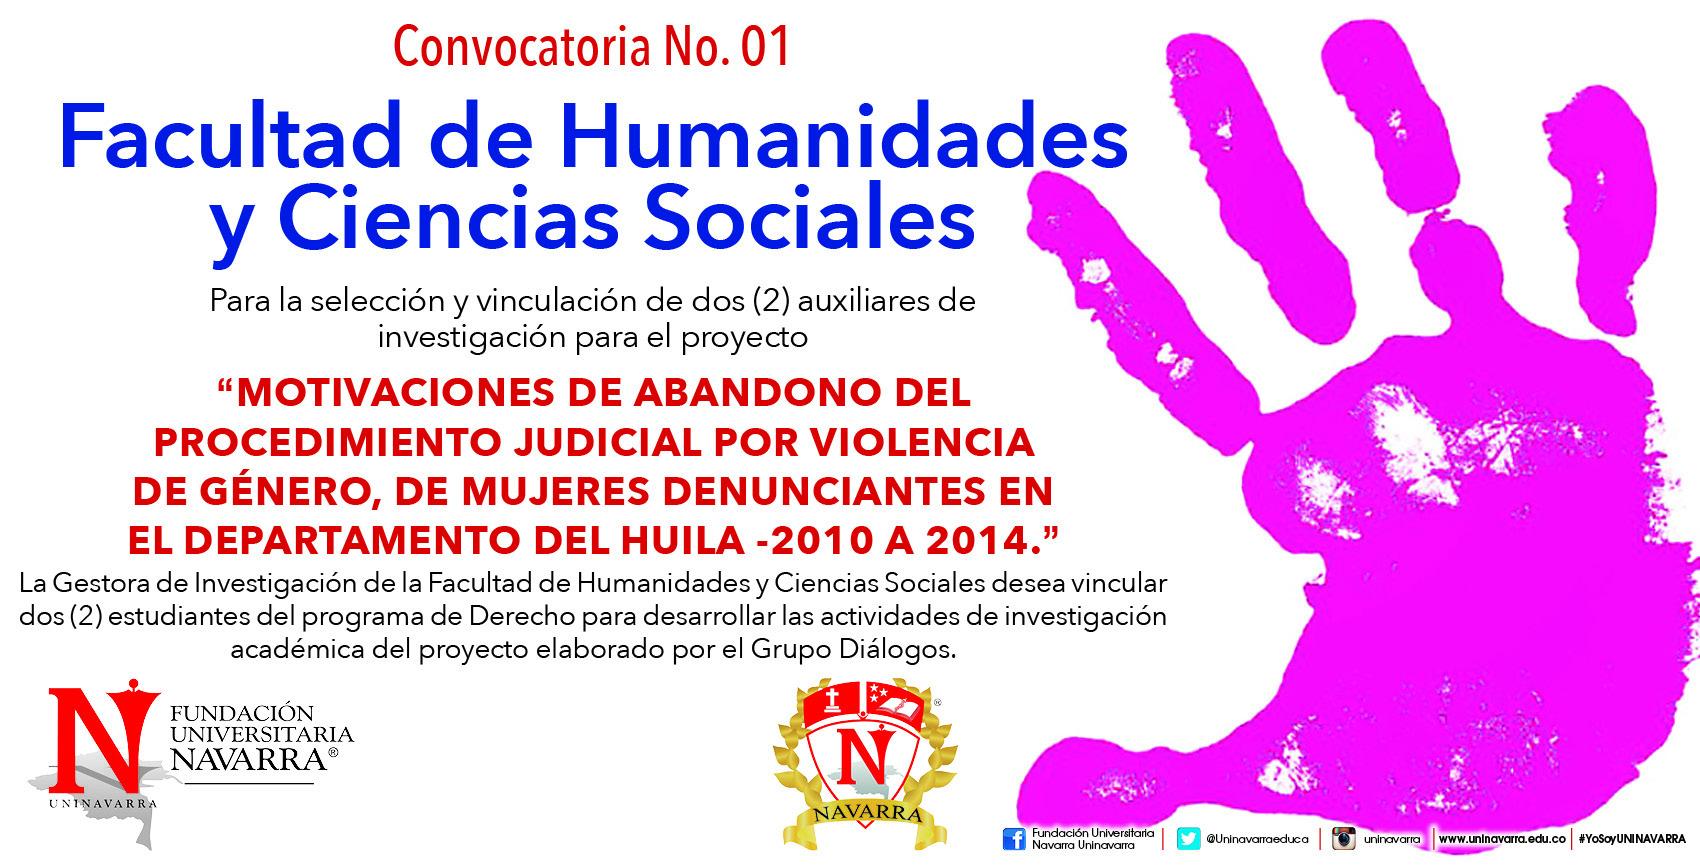 Ministerio educacion colombia vacantes 2016 black for Convocatoria docentes 2016 ministerio de educacion